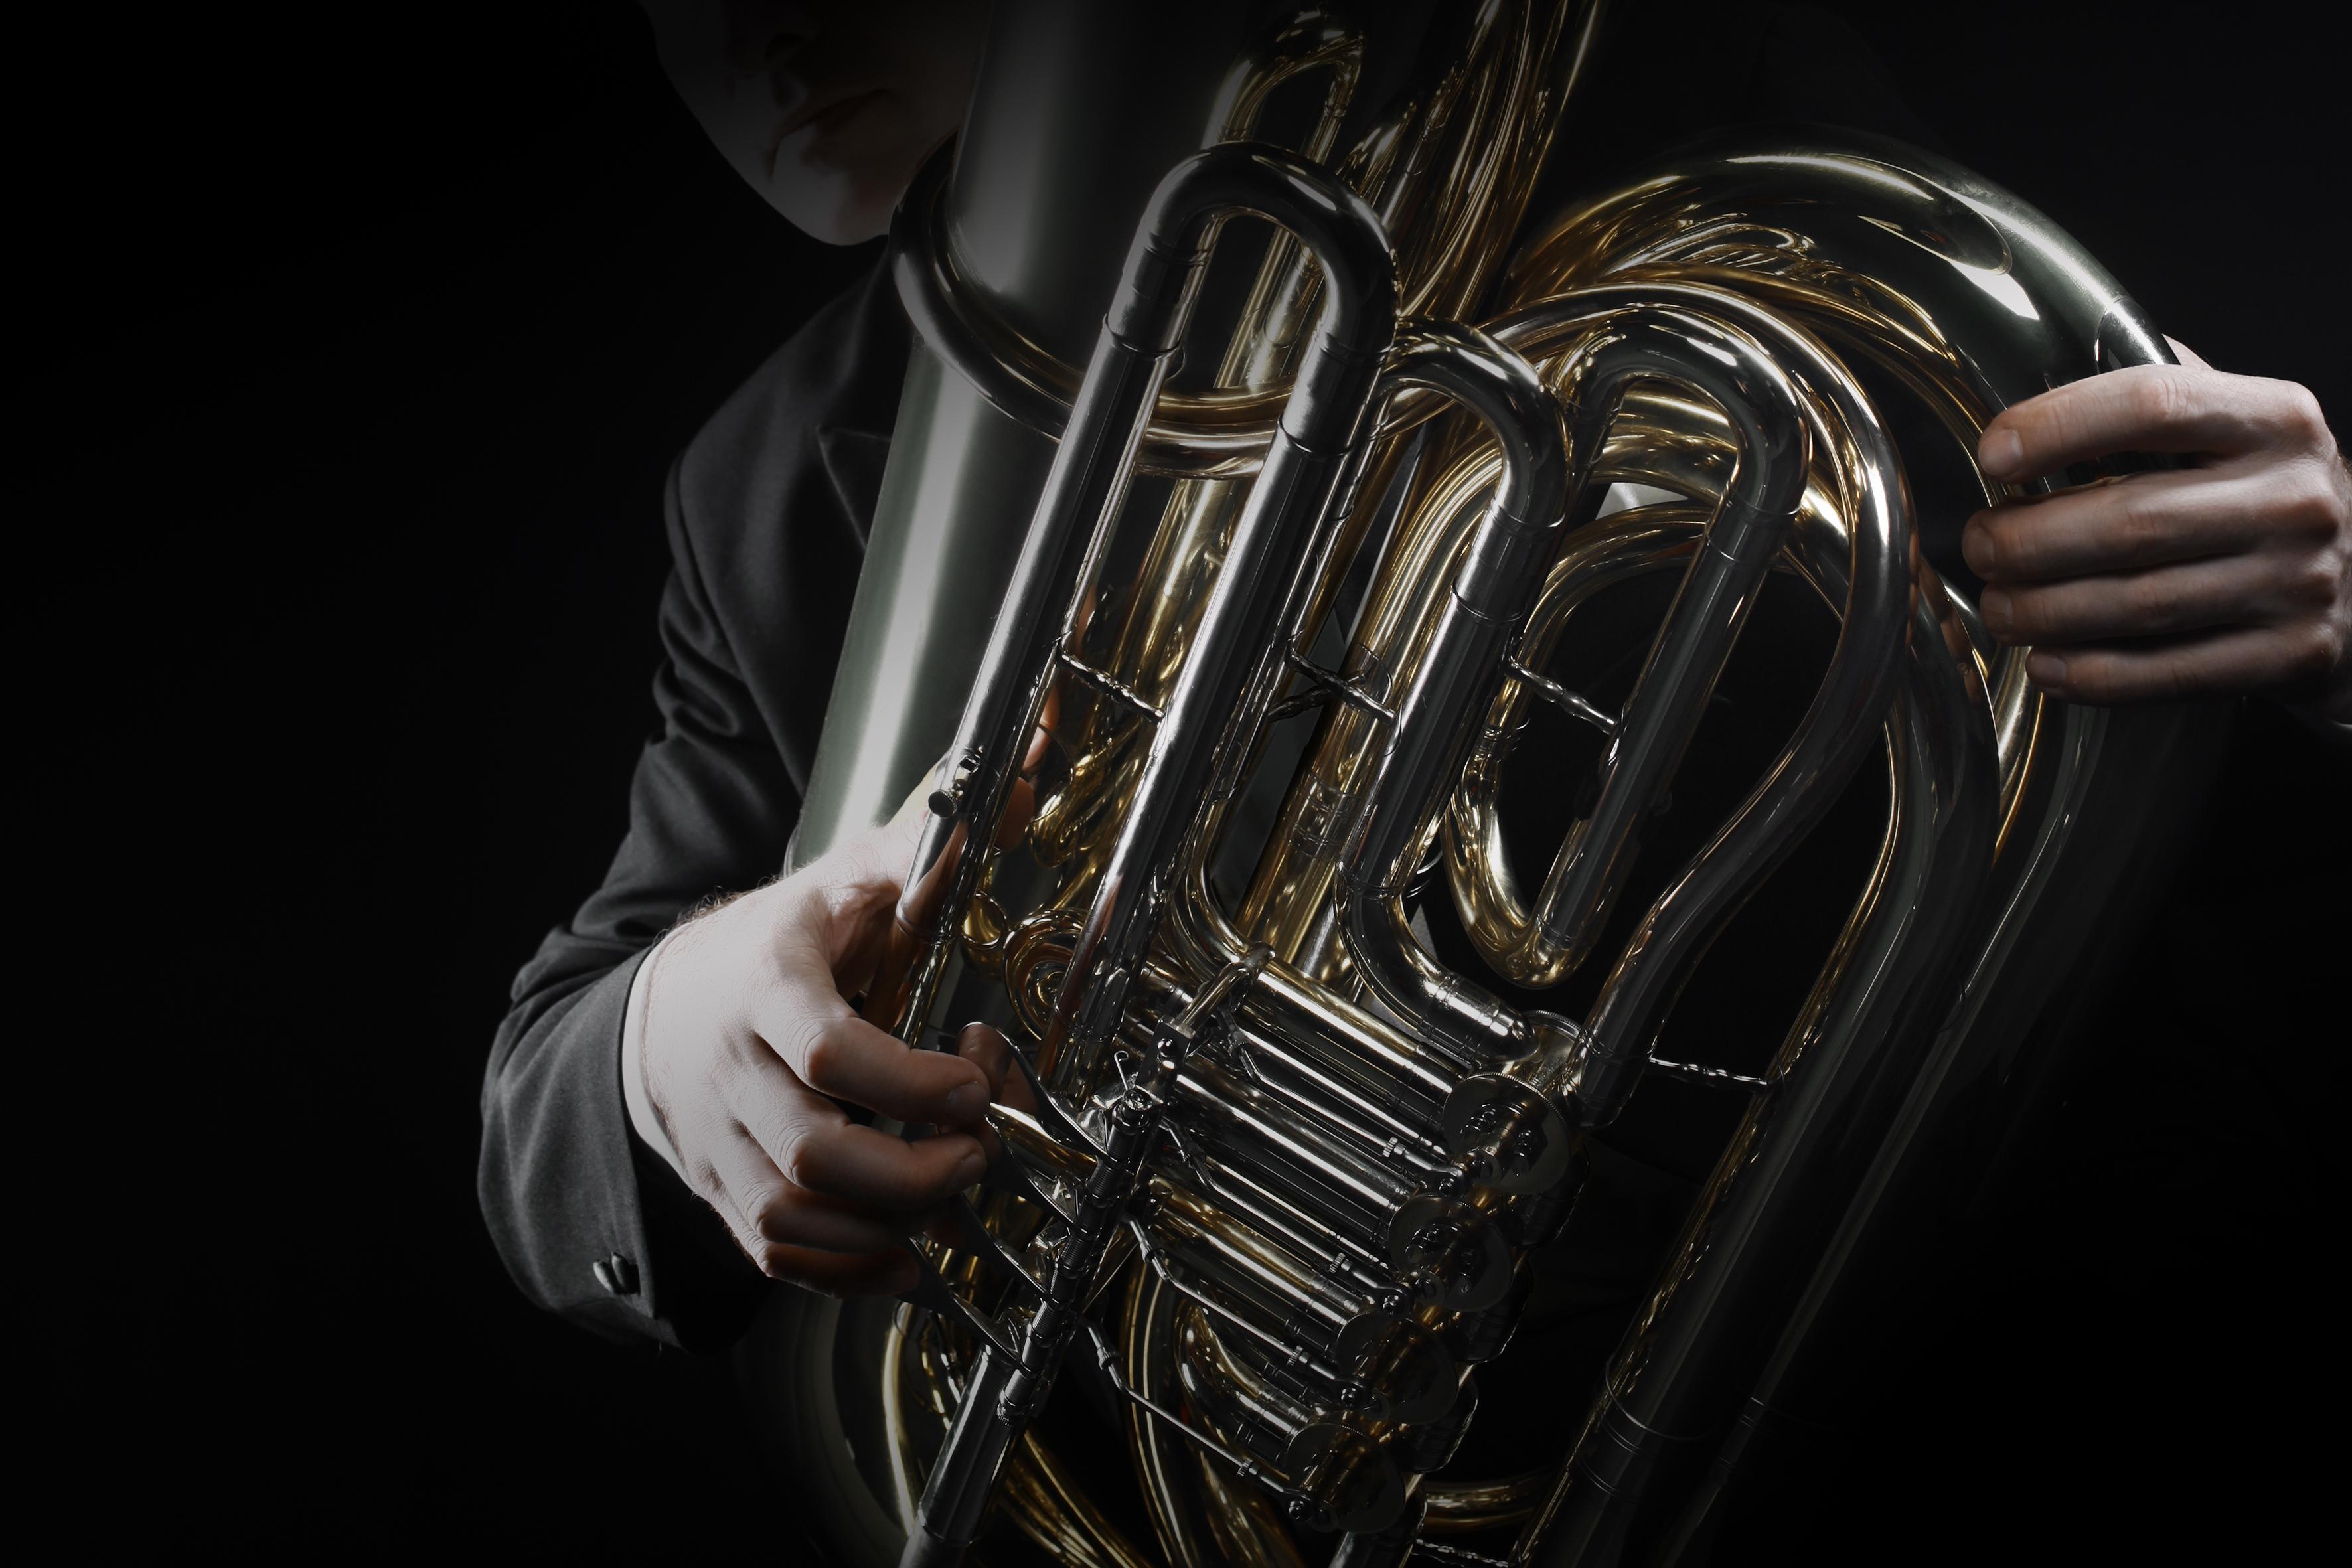 Tuba brass instrument. Wind music horn player